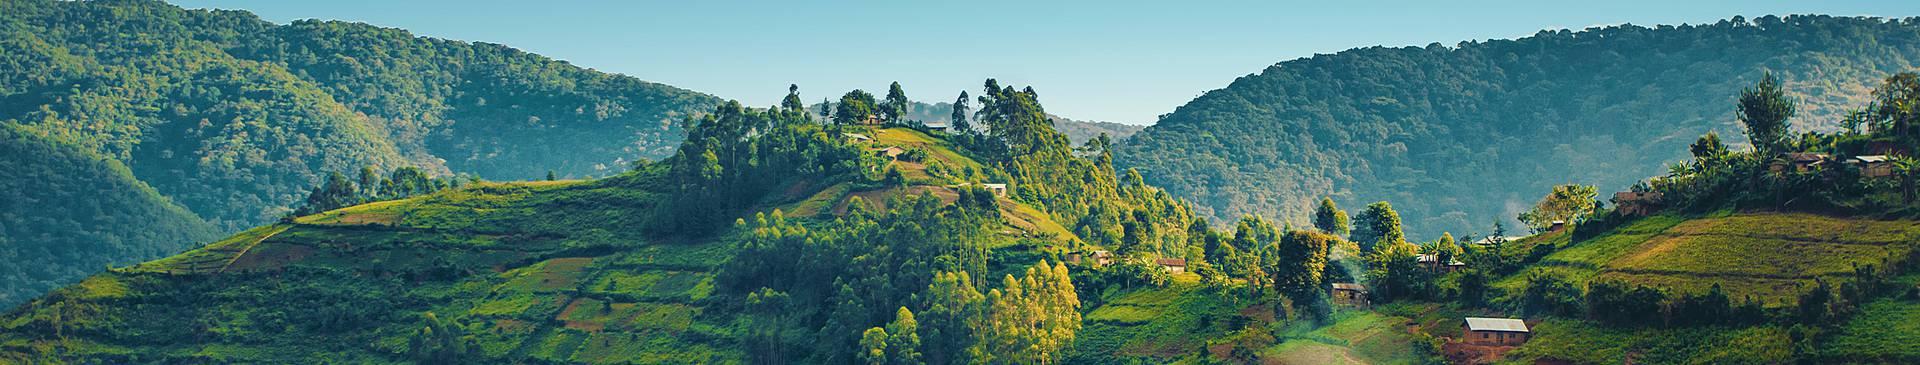 Naturreisen Ruanda